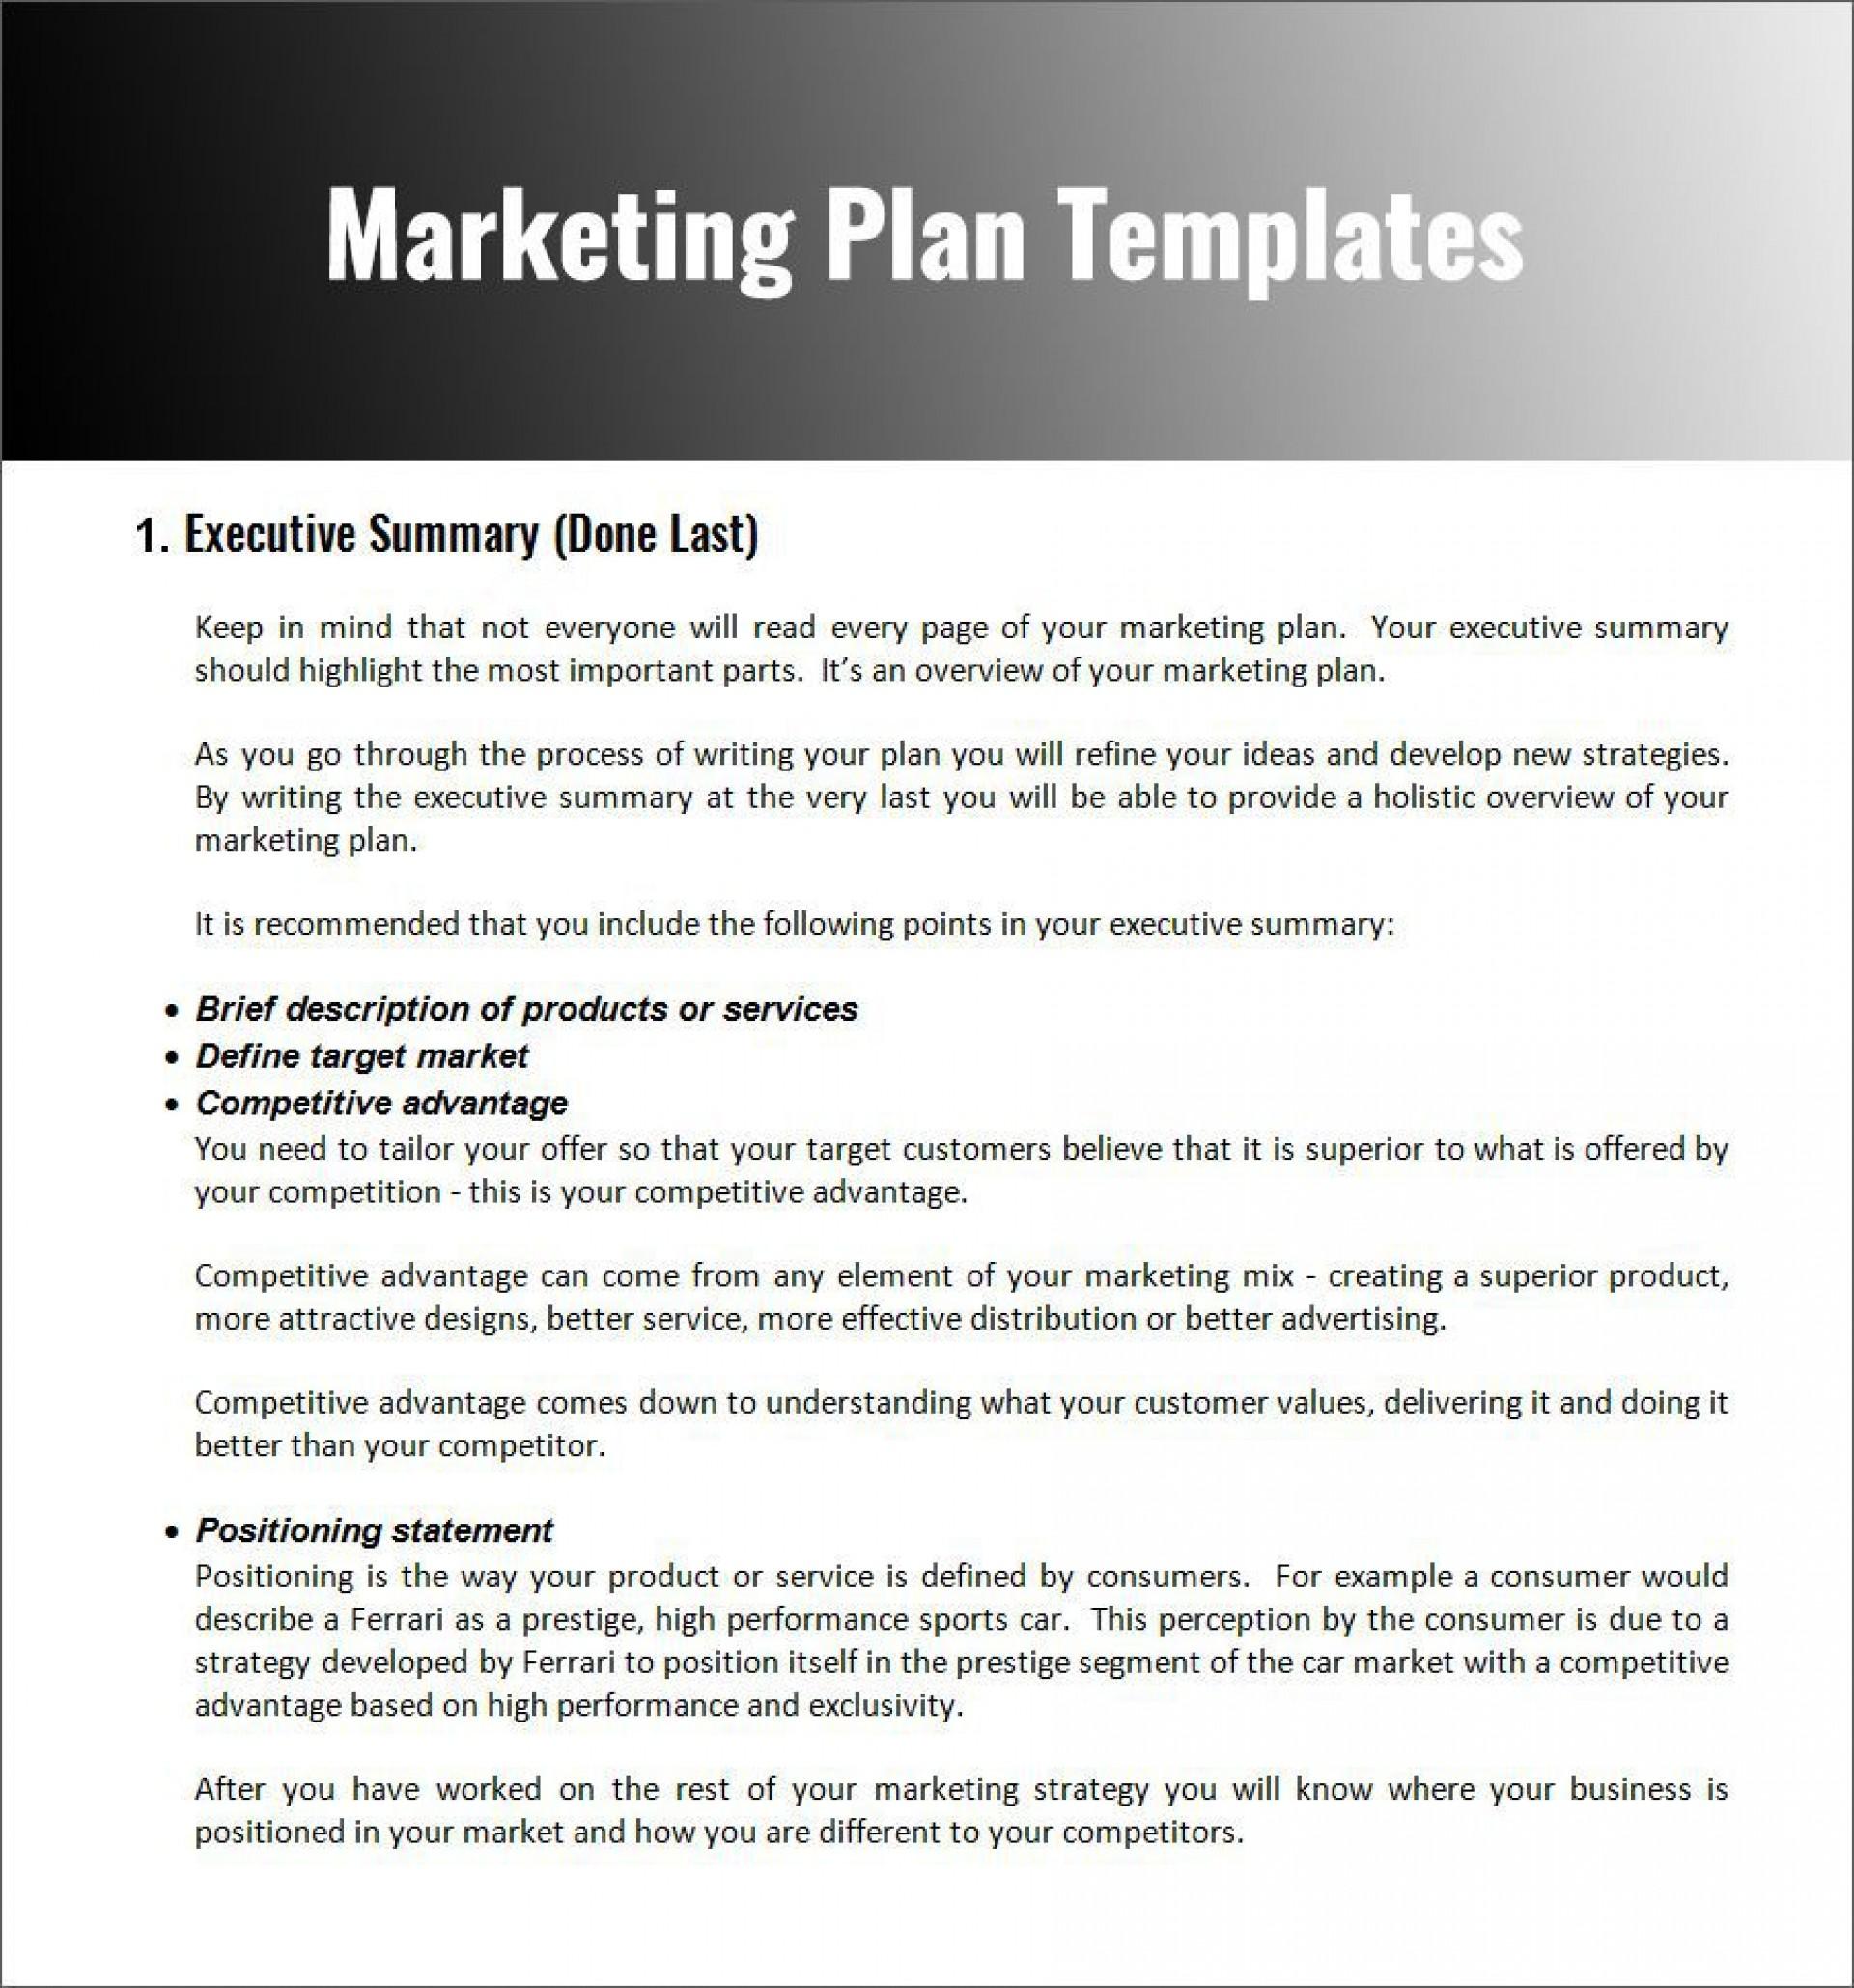 003 Fascinating Free Marketing Plan Template Word Photo  Digital Download1920